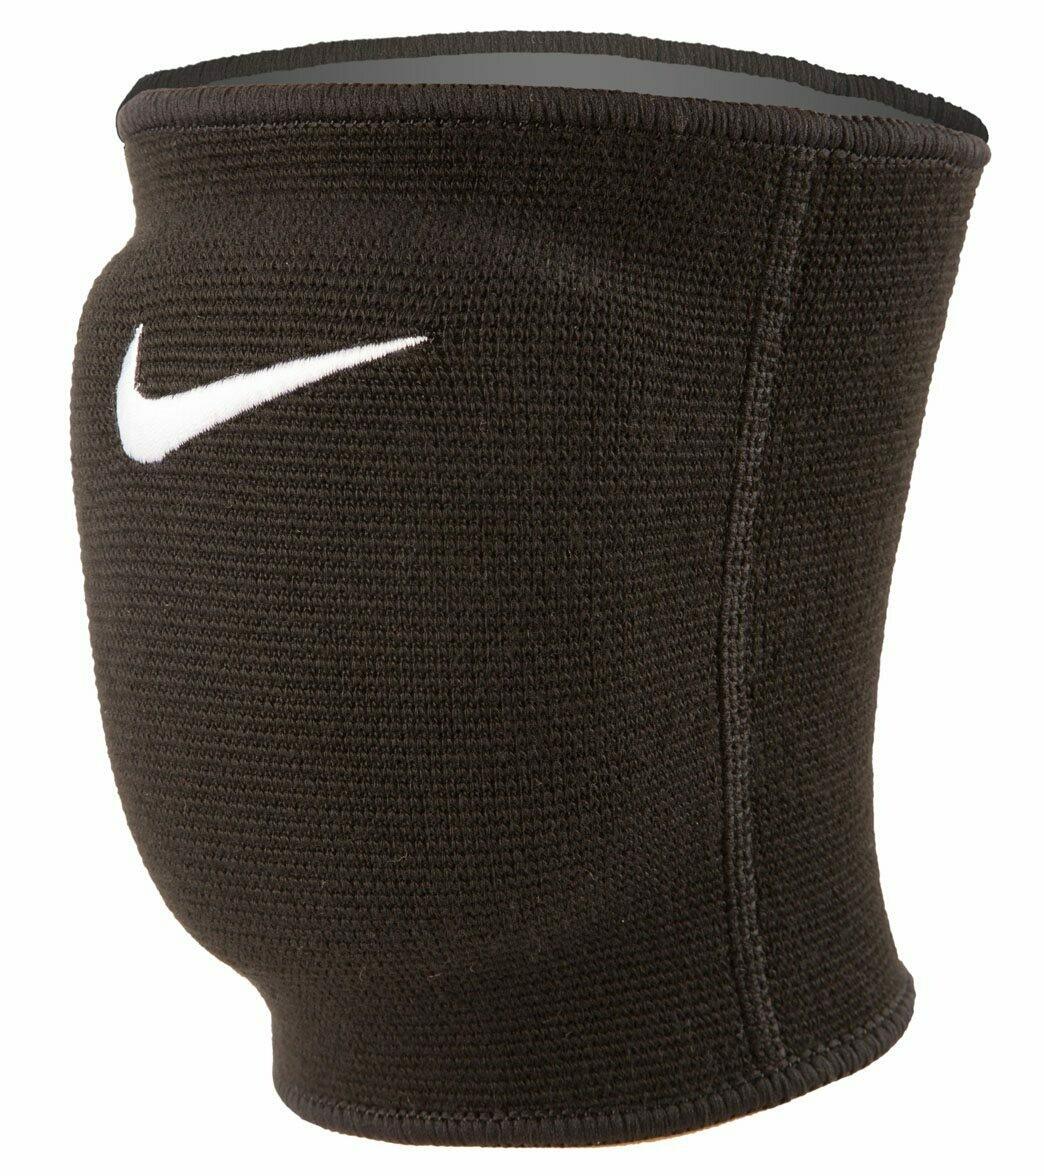 Nike Volleyball Kneepads Black